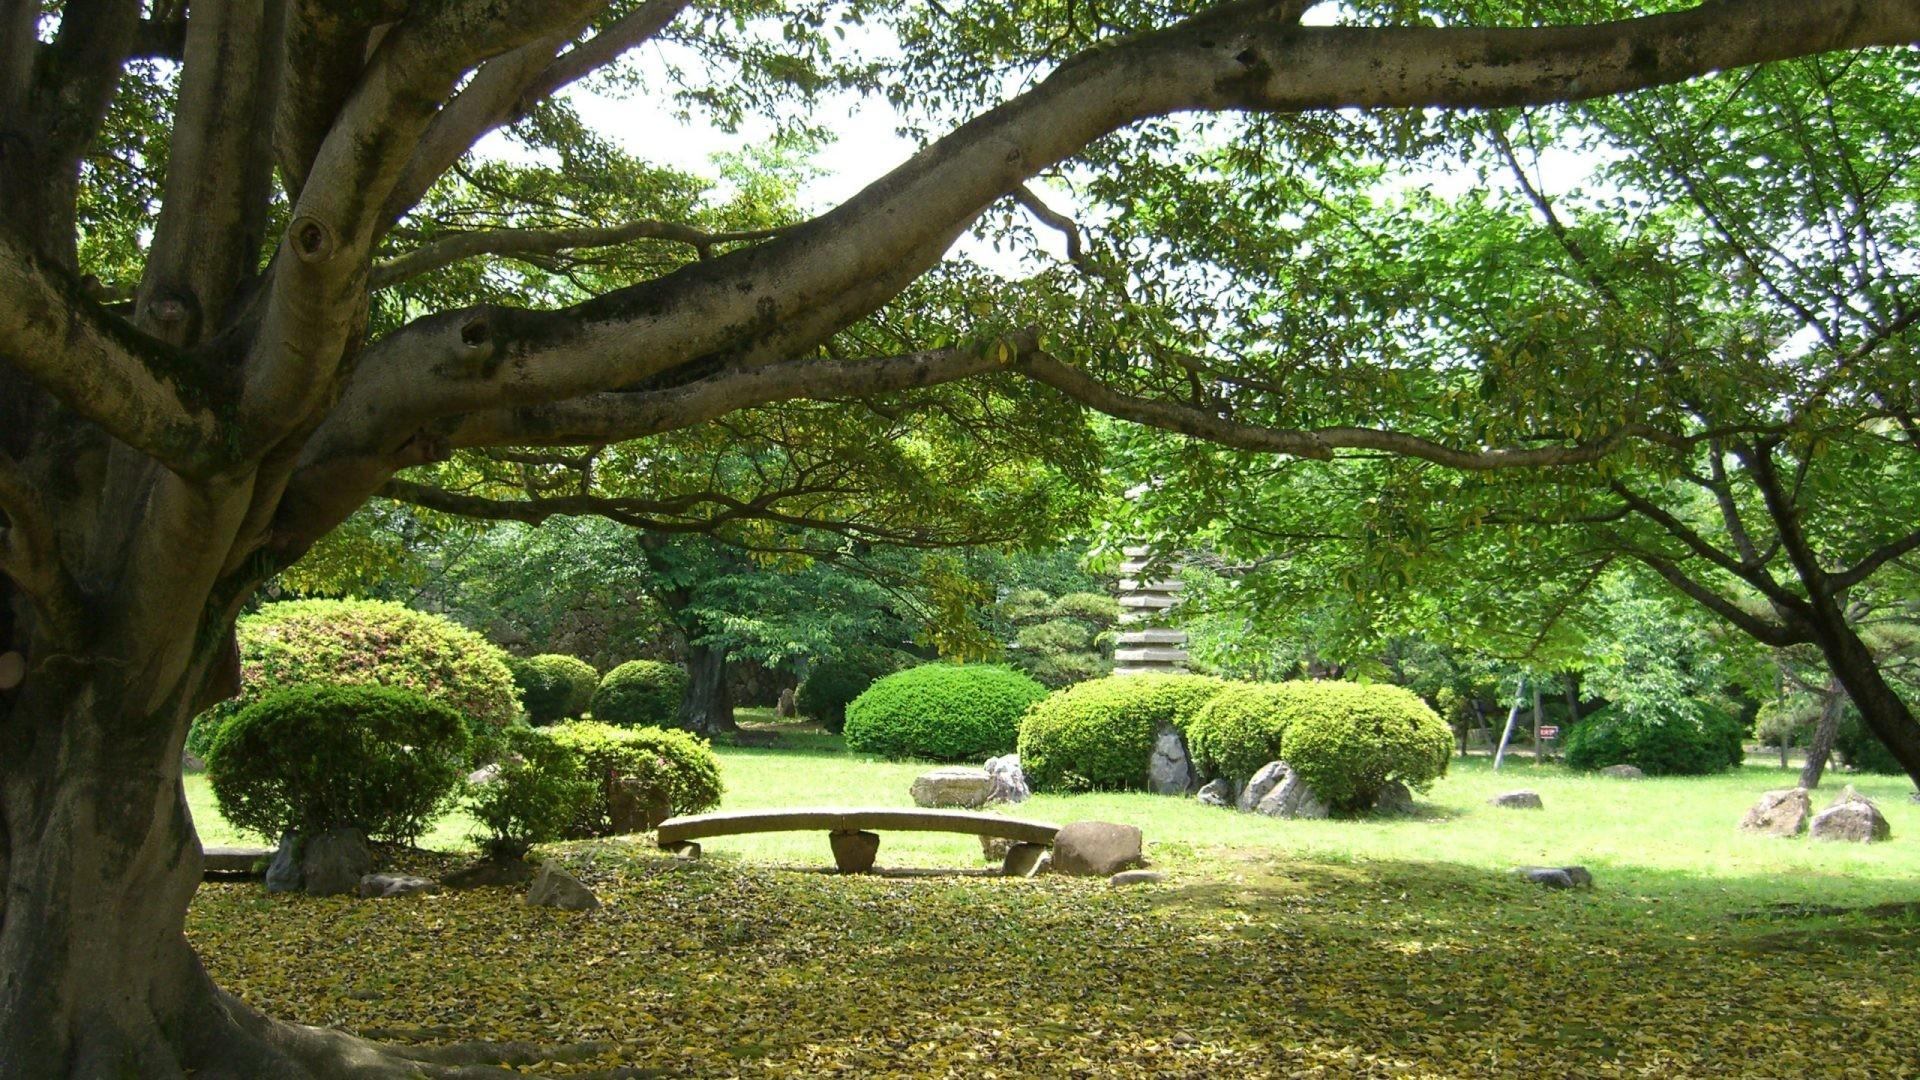 Gardens Tag – Japanese Gardens Seat Trees Zen Statue Grounds Tranquil Japan  Shrubs Leaves Himeji Castle